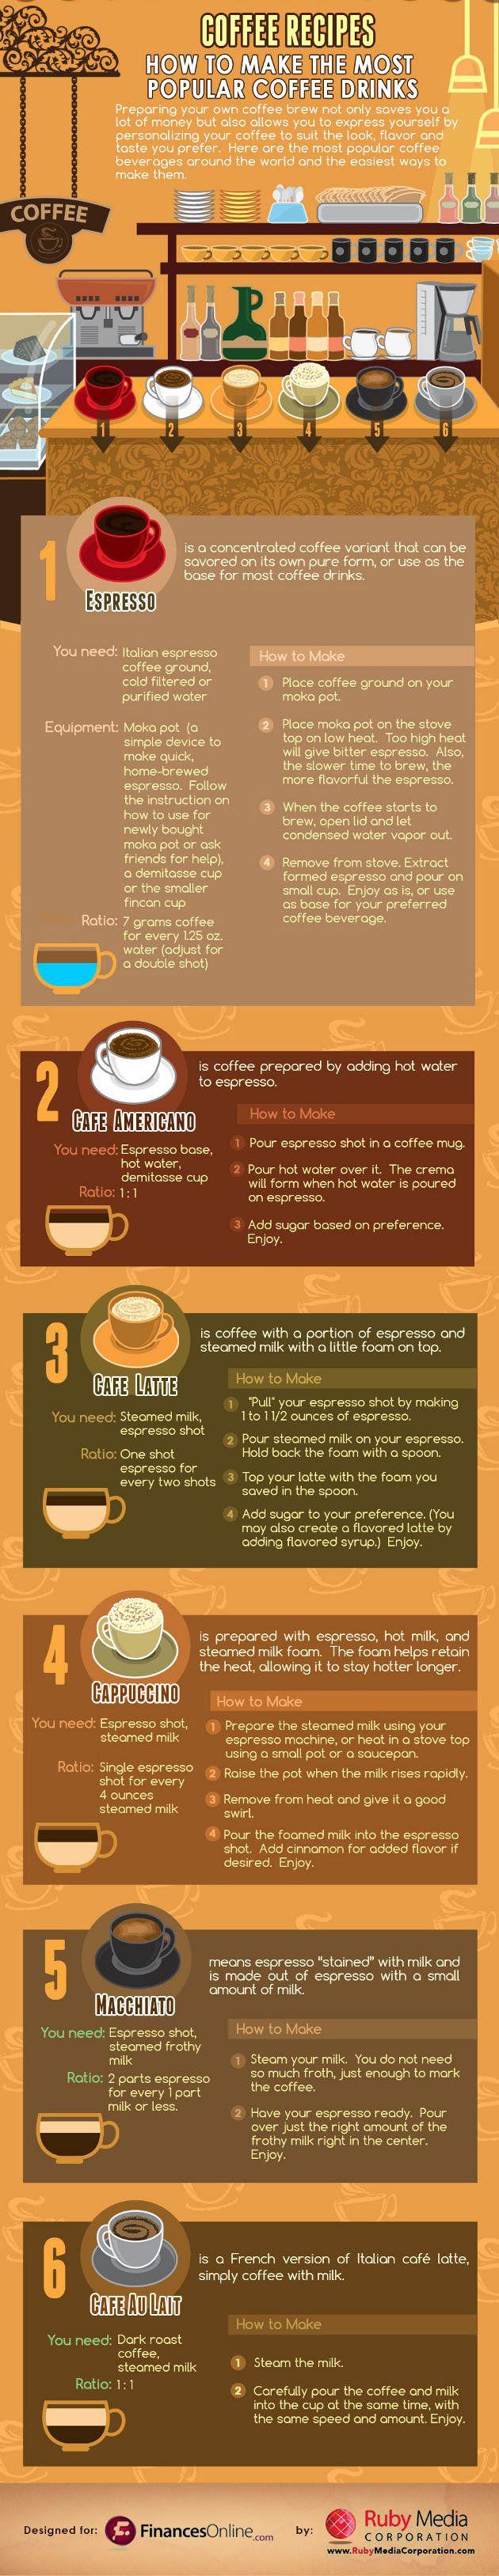 Yahoo Style Singapore Coffee Recipes Coffee Drinks Coffee Shop